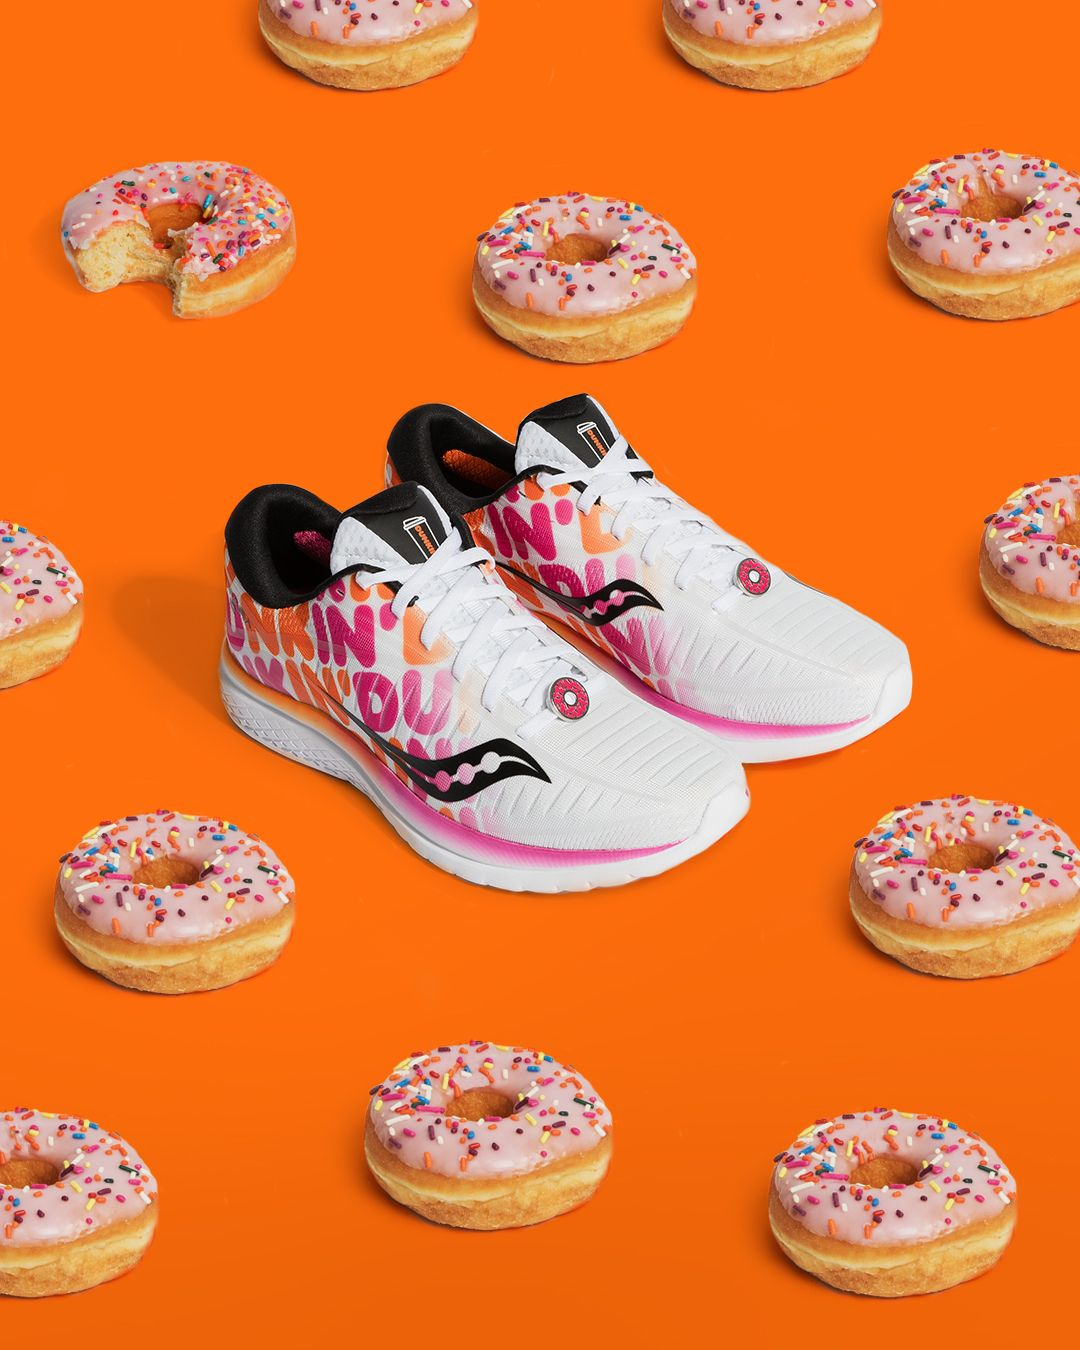 Dunkin  Released A New Donut Sneaker - Saucony x Dunkin  Kinvara e5b2a71516a